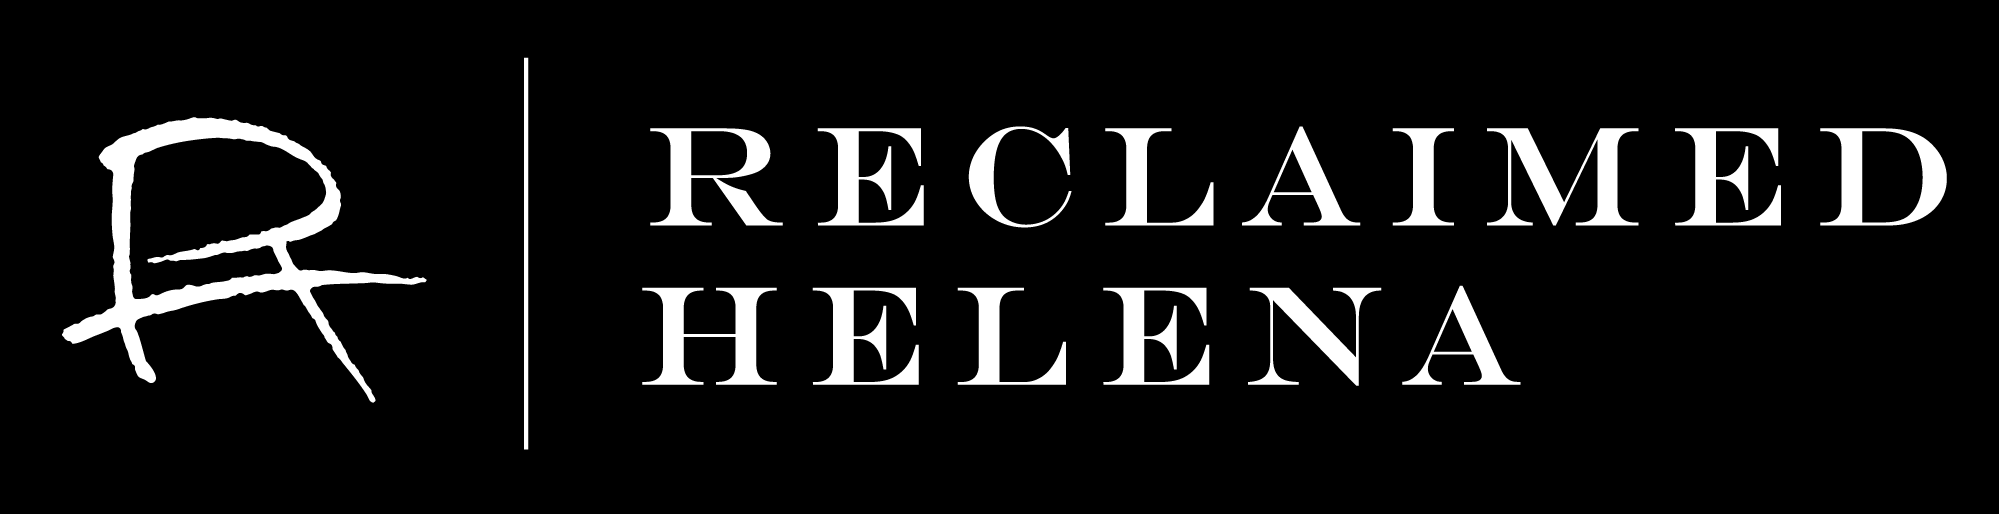 rh_stamp-logo-black.png